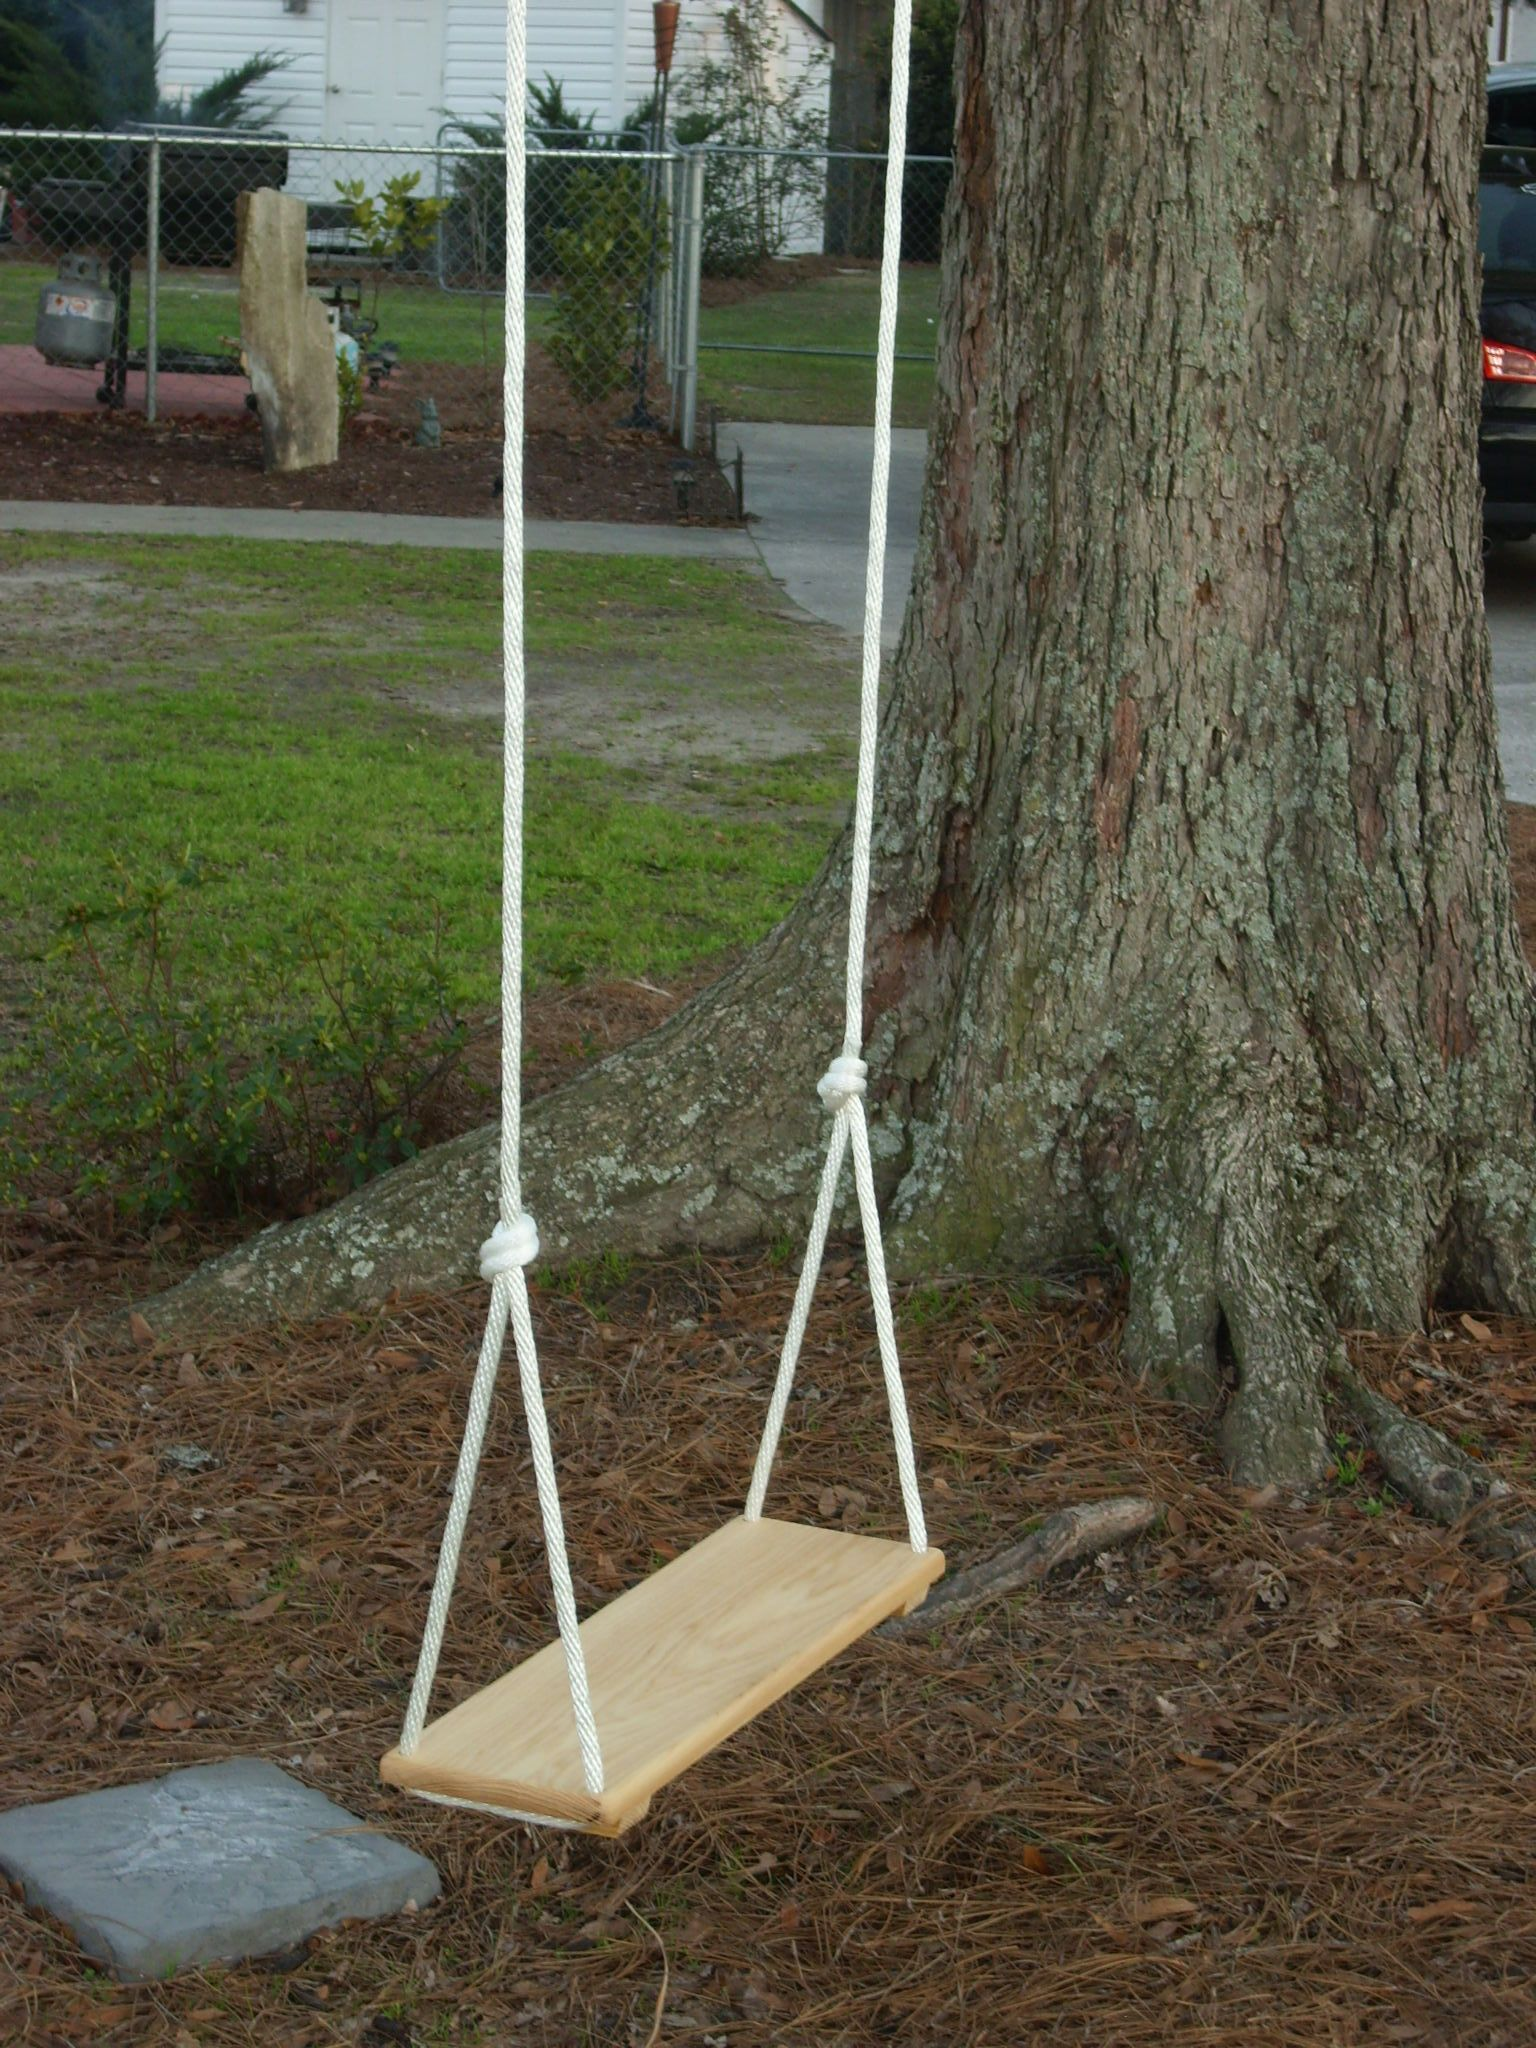 Old Fashioned Rope Swing This Brings Back Some Wonderful Childhood Memories Tree Swing Rope Swing Swing